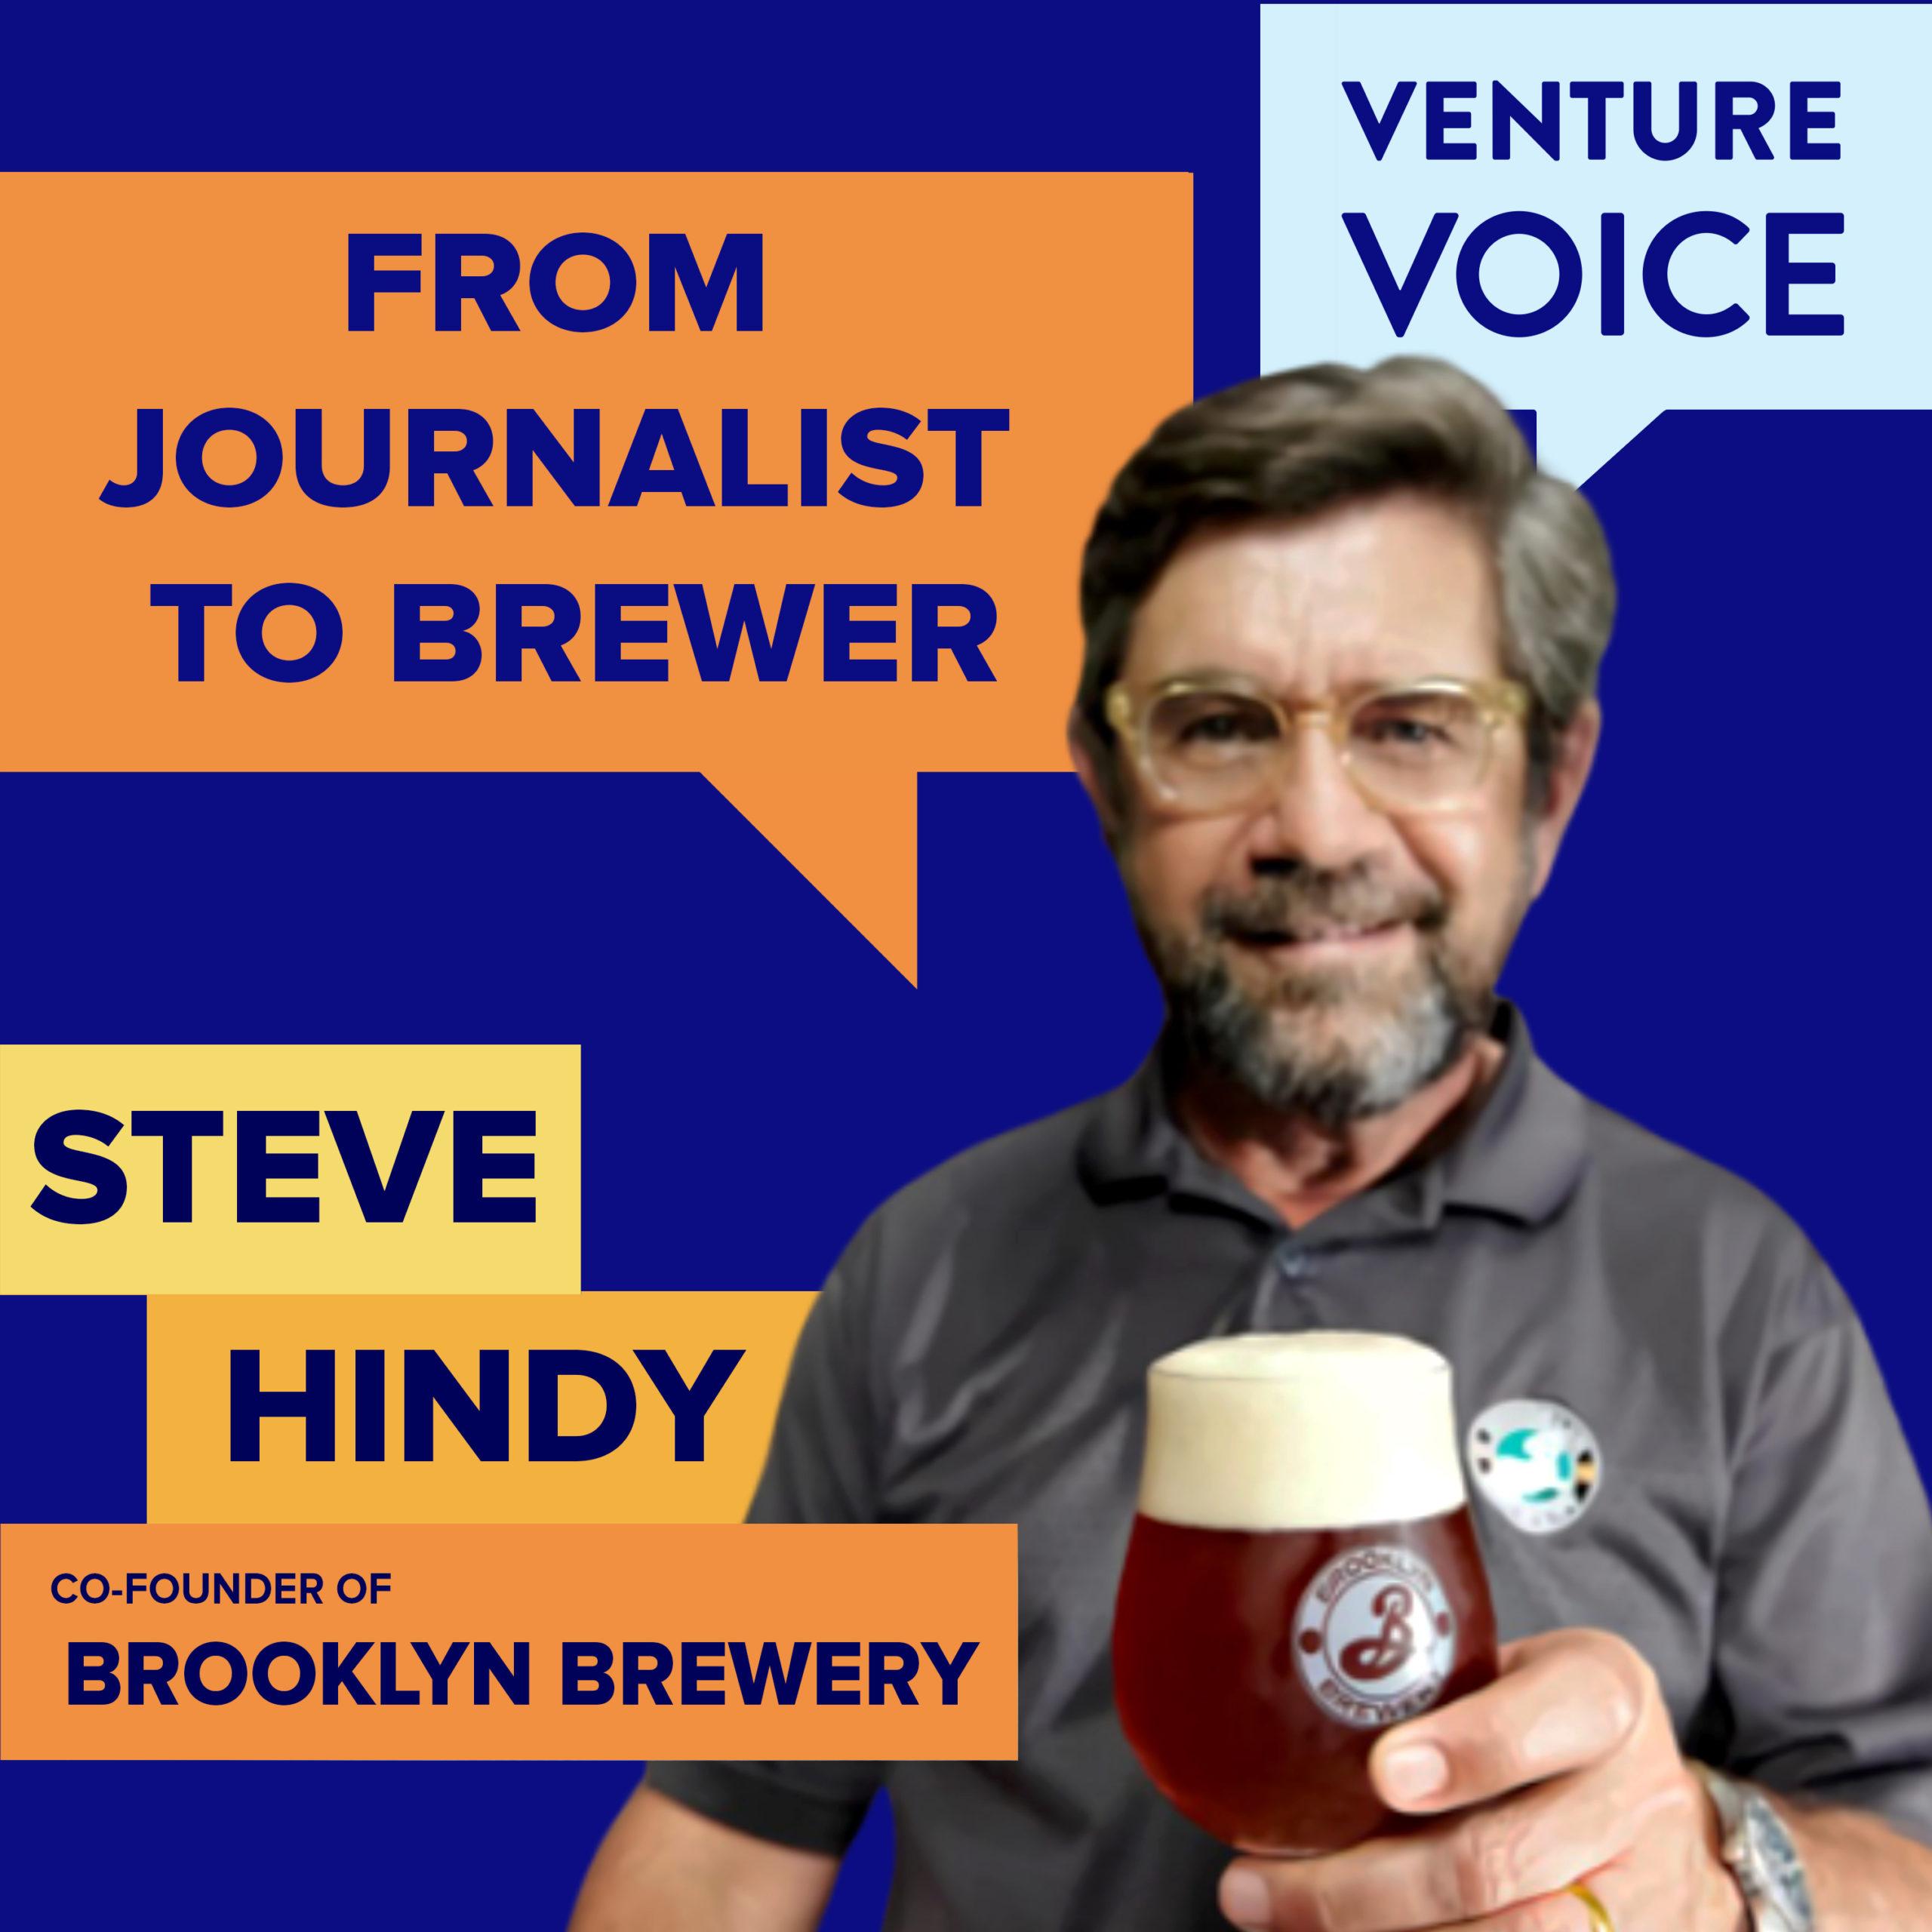 Steve Hindy of Brooklyn Brewery